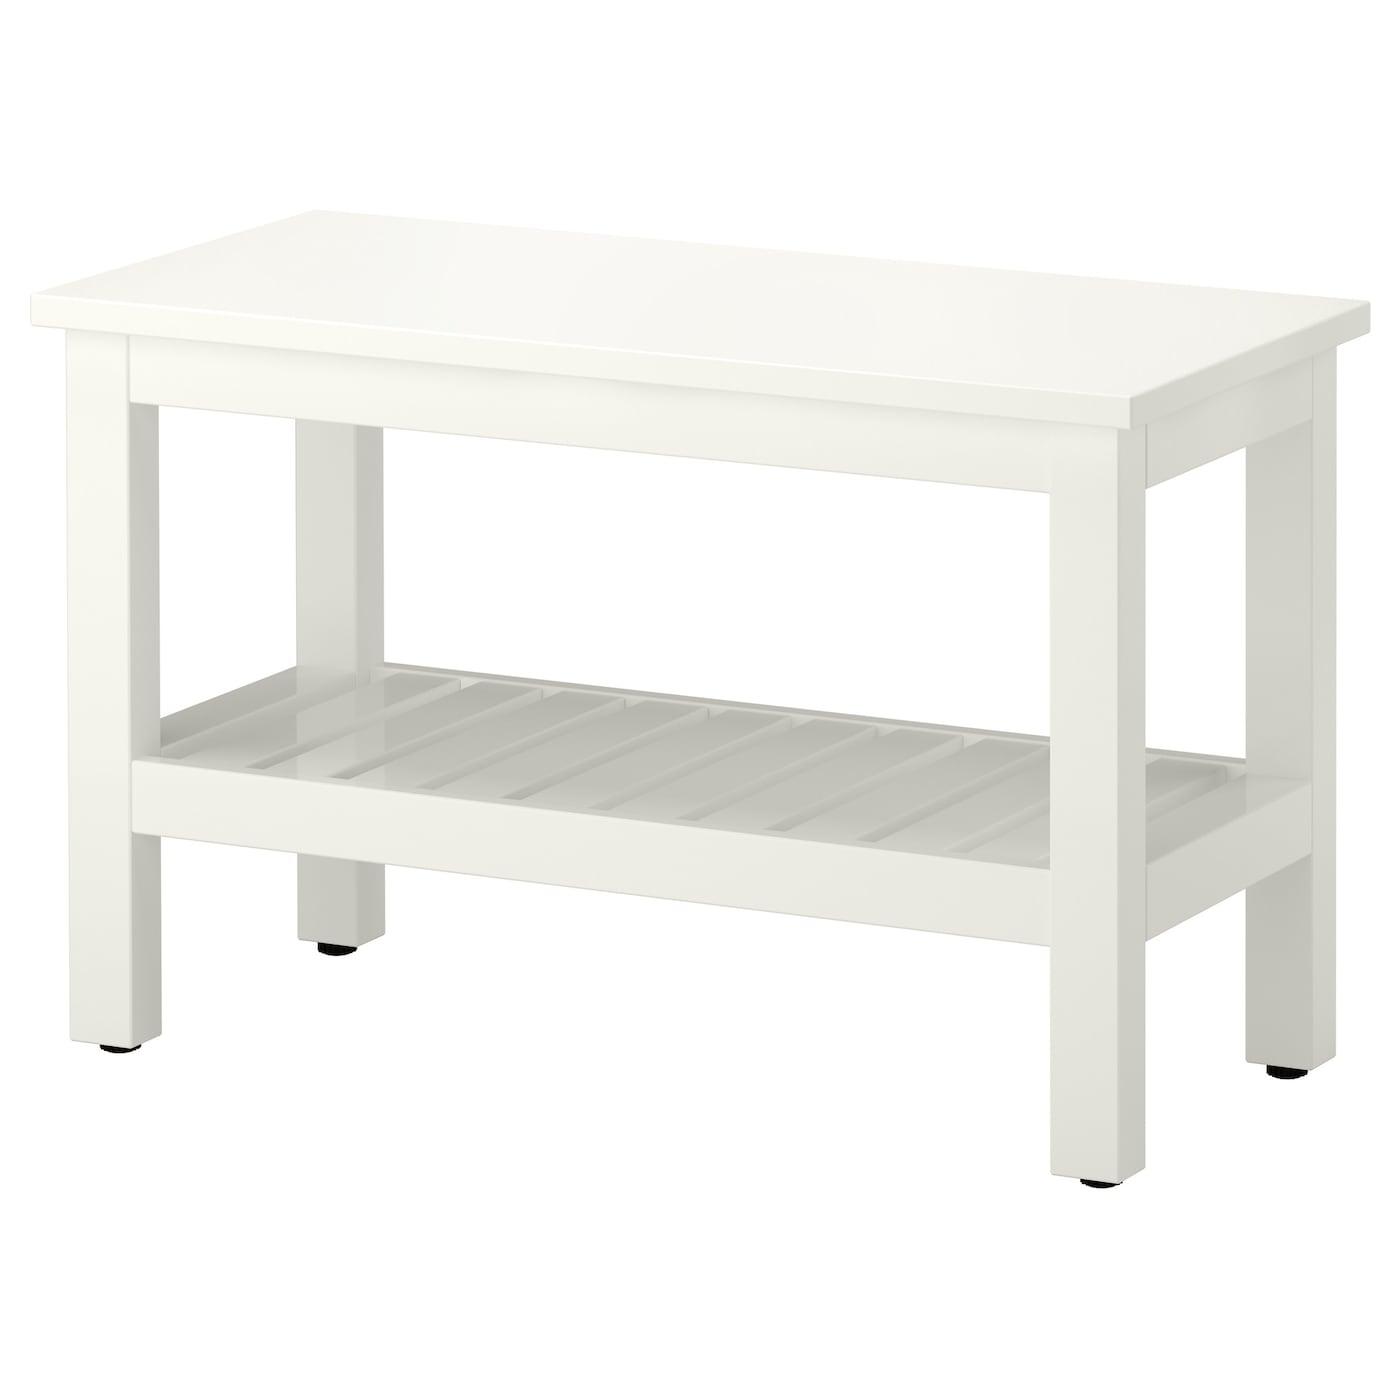 HEMNES Bench White 83 cm IKEA